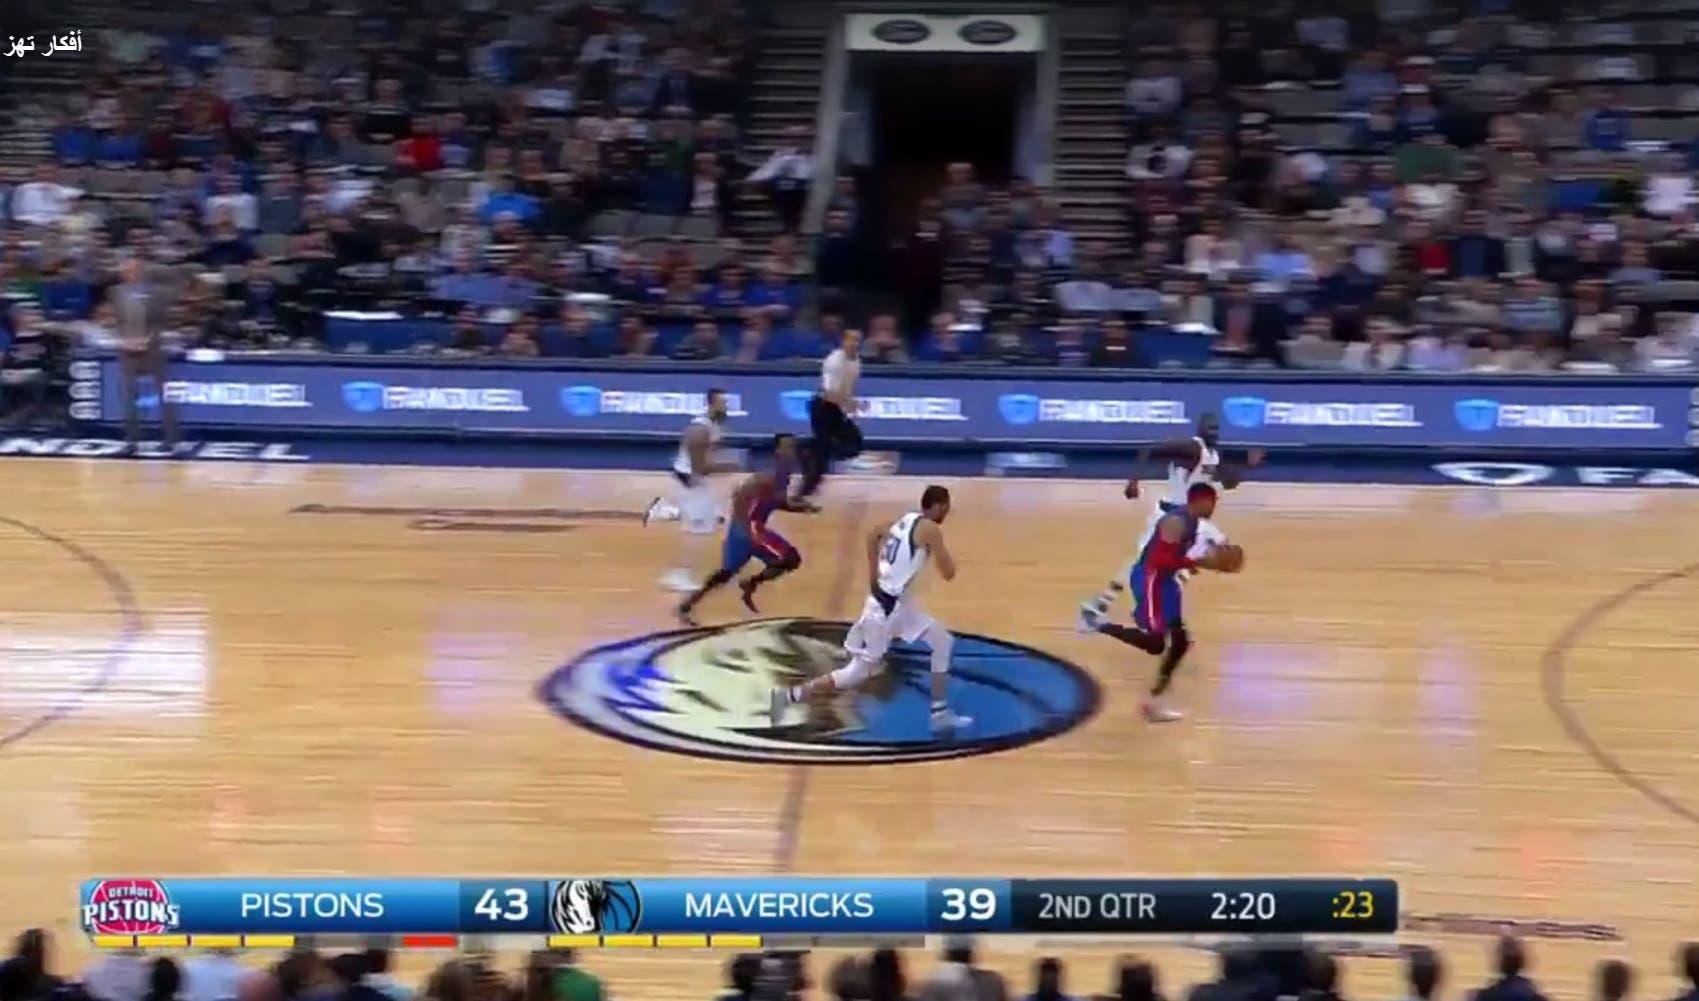 Mavericks' Saleh Mejri is close behind Harris as running for the counter. (Screengrab)